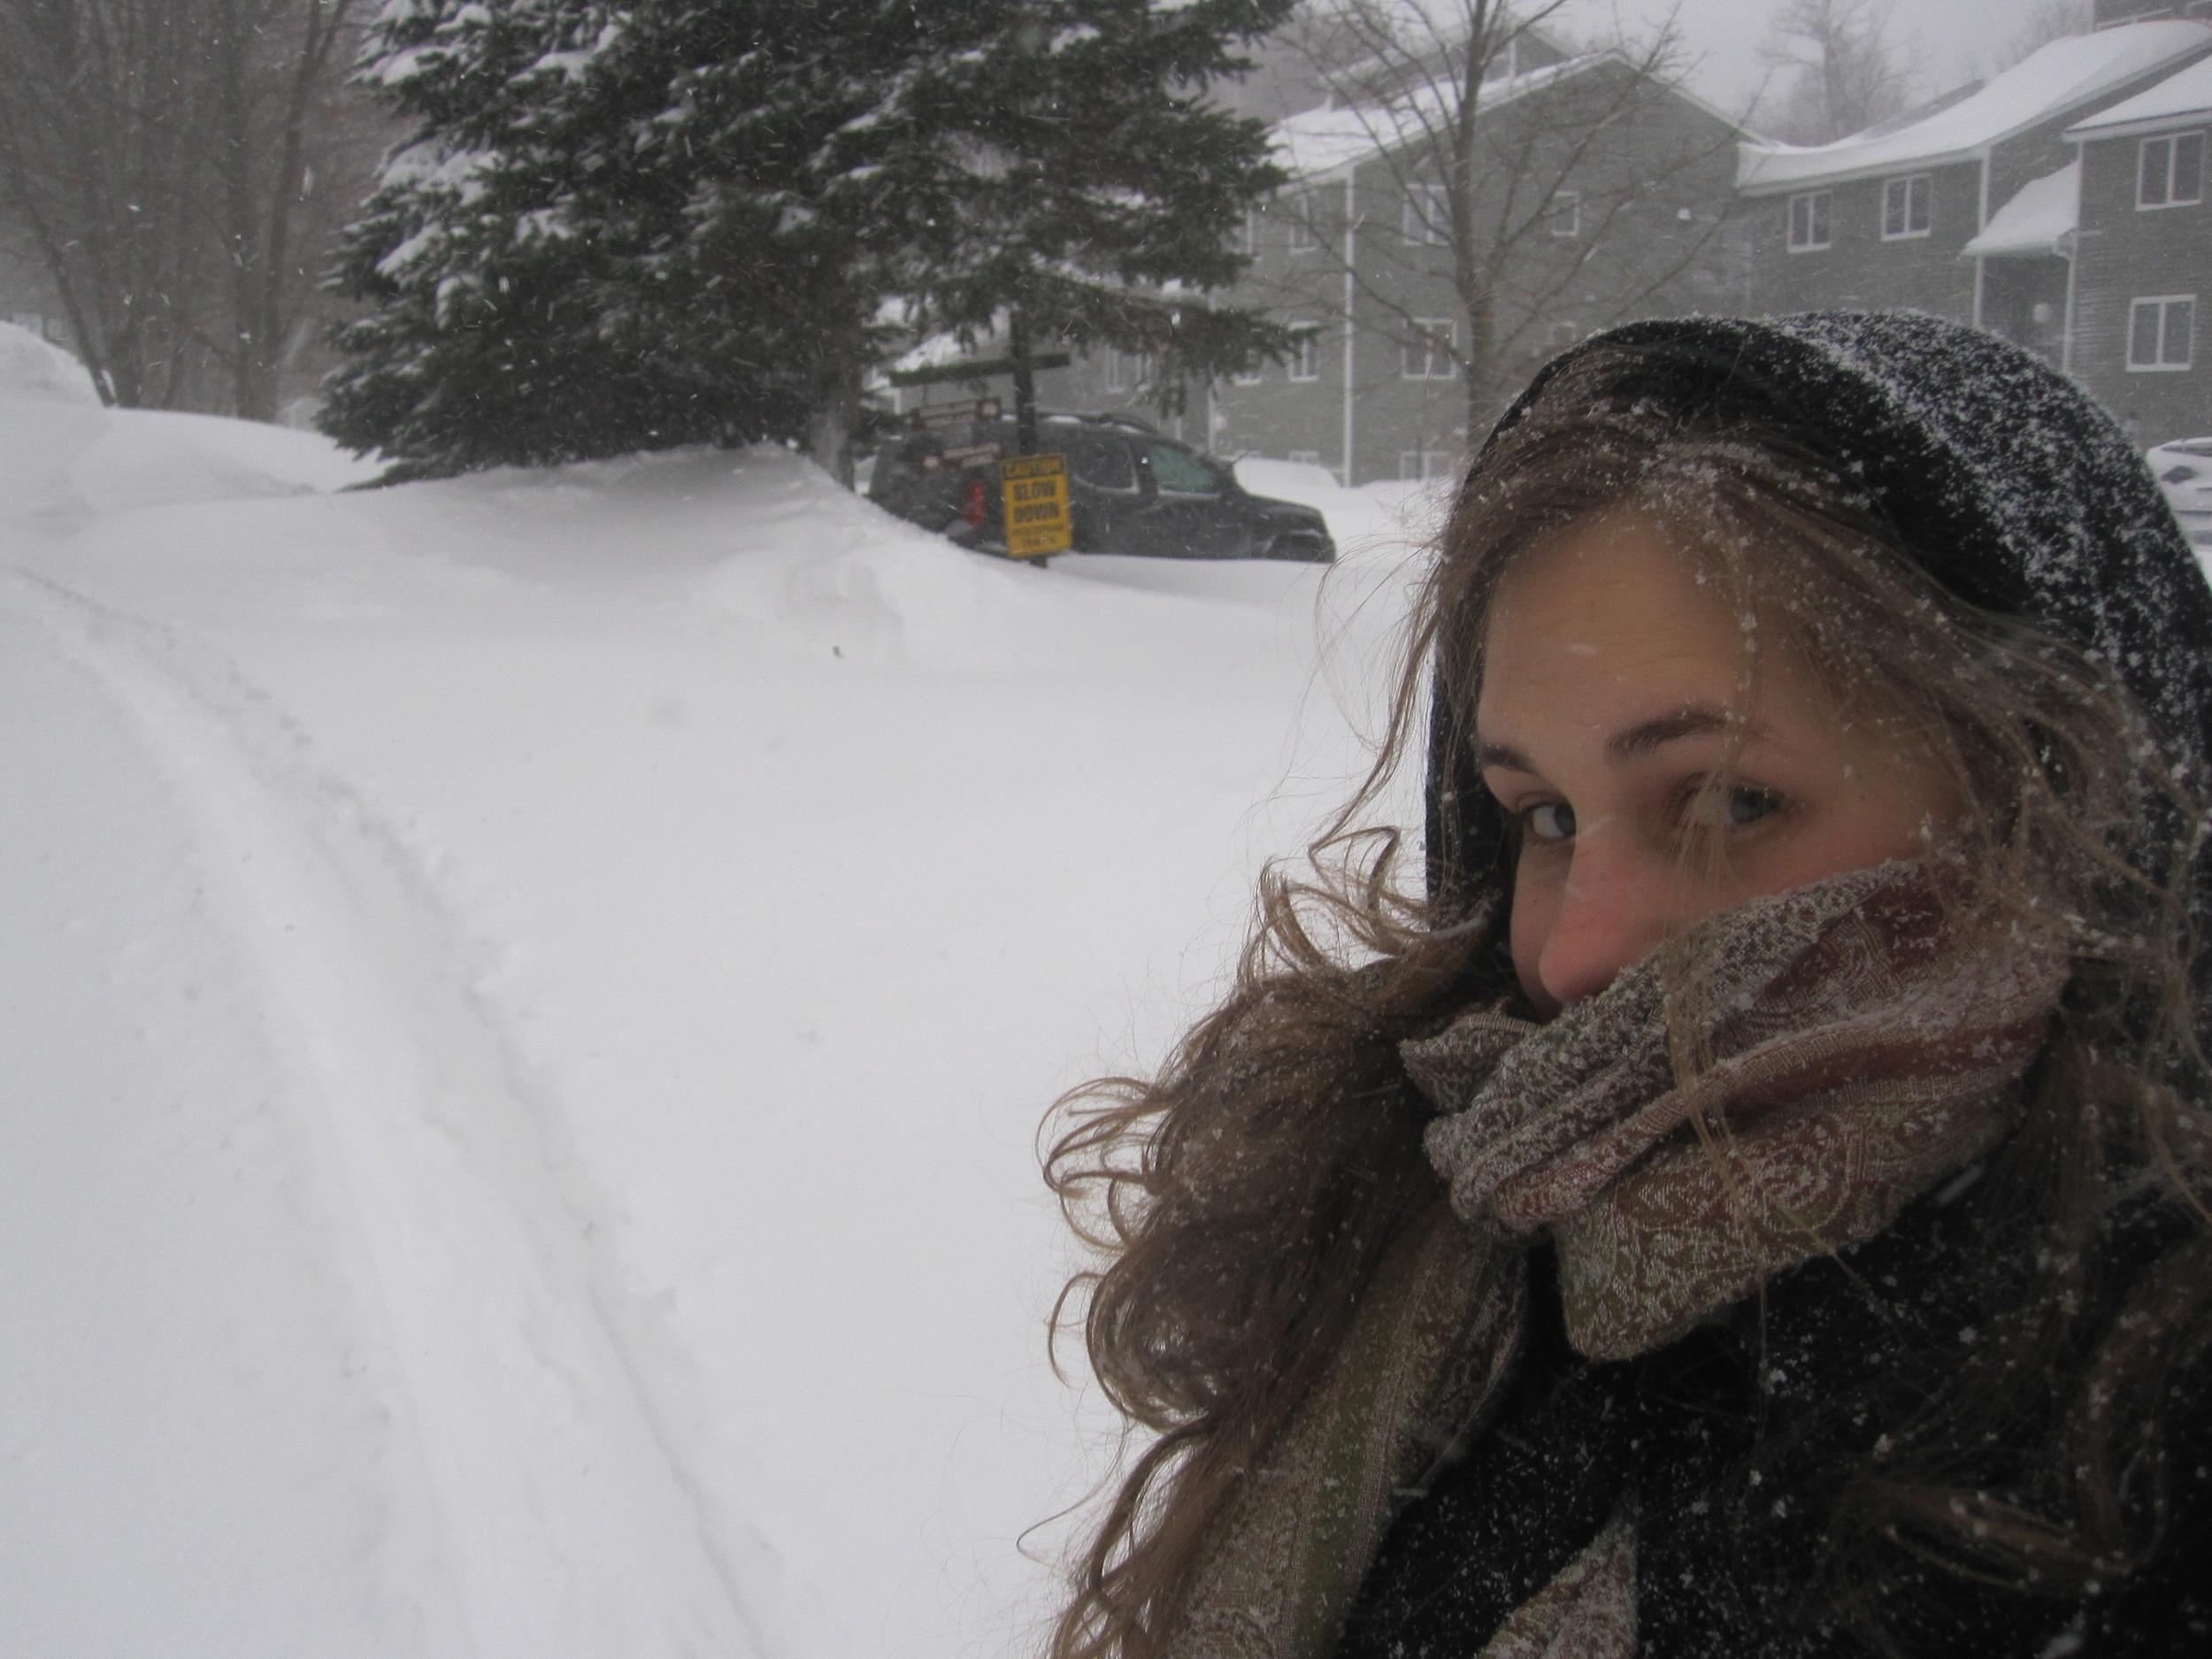 ariele-in-winter-in-nh